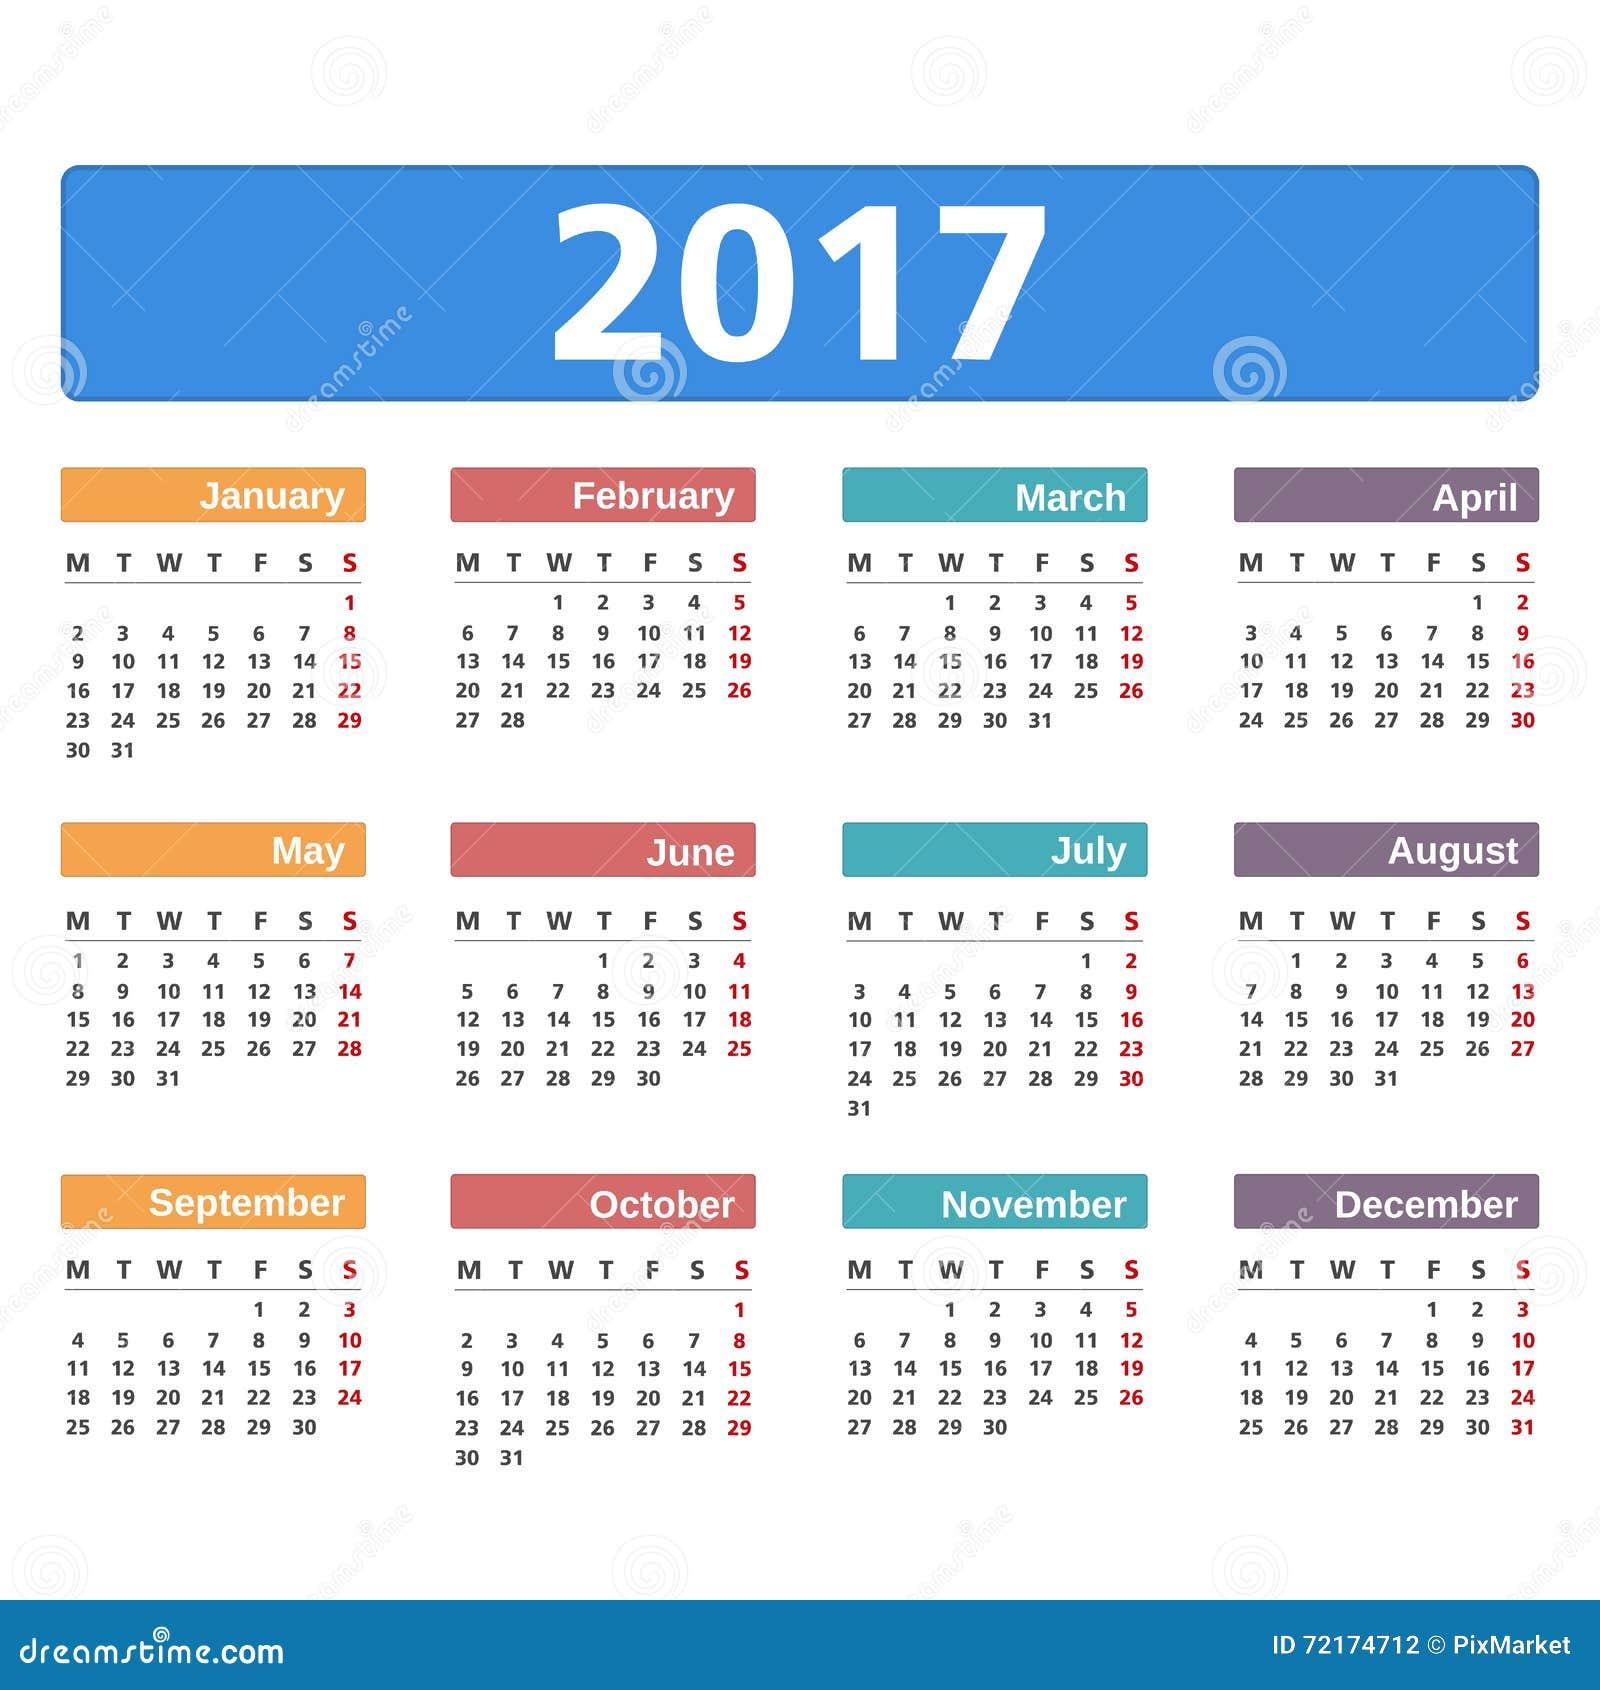 2017 Calendar Stock Vector Illustration Of Schedule 72174712